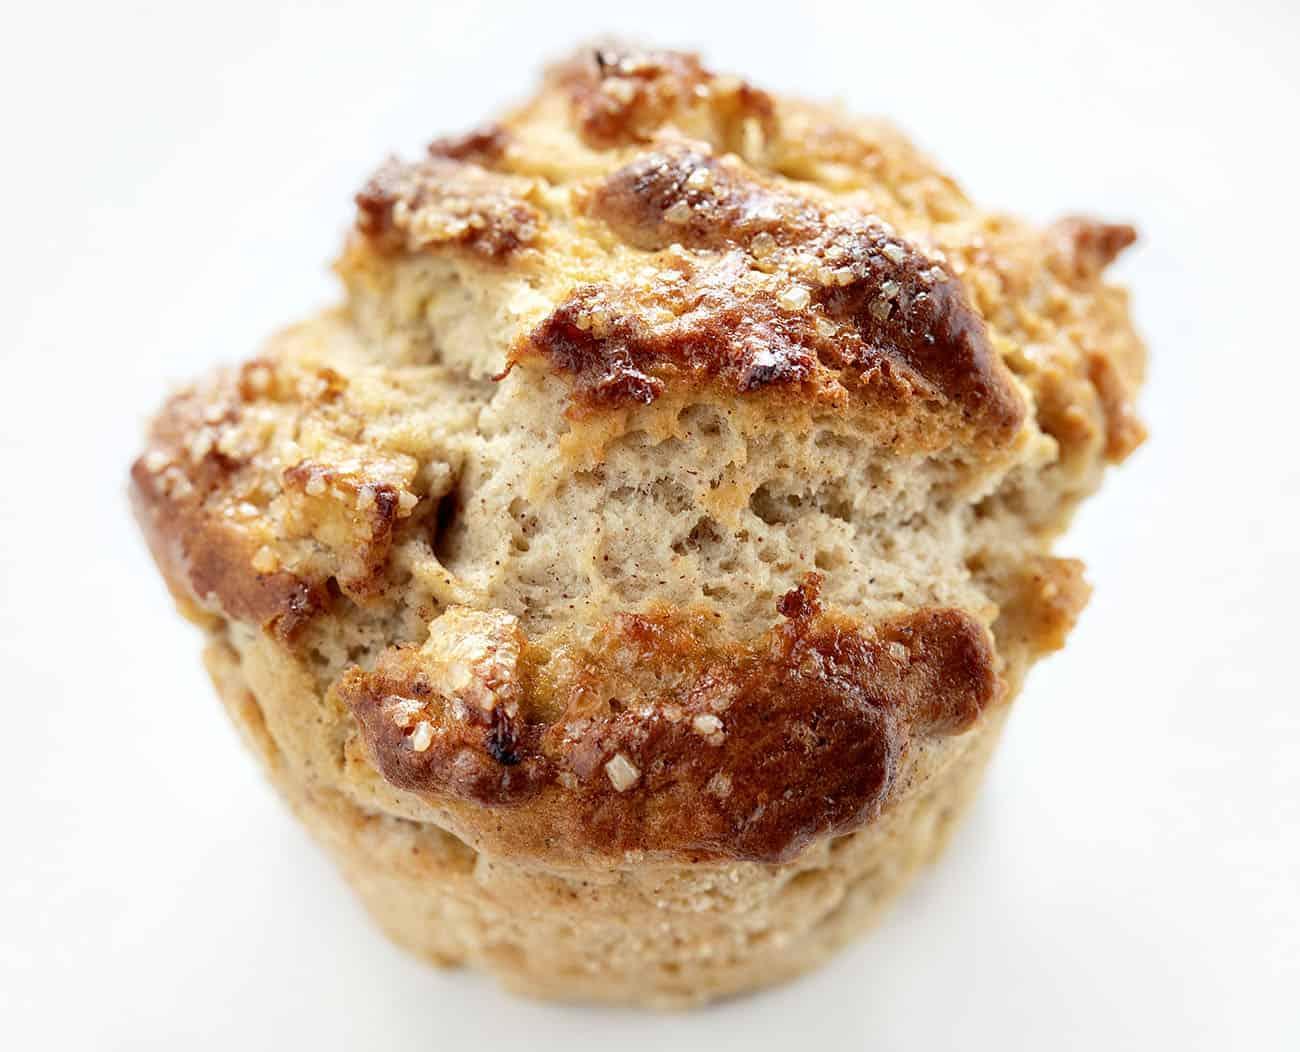 UnGlazed Apple Muffin